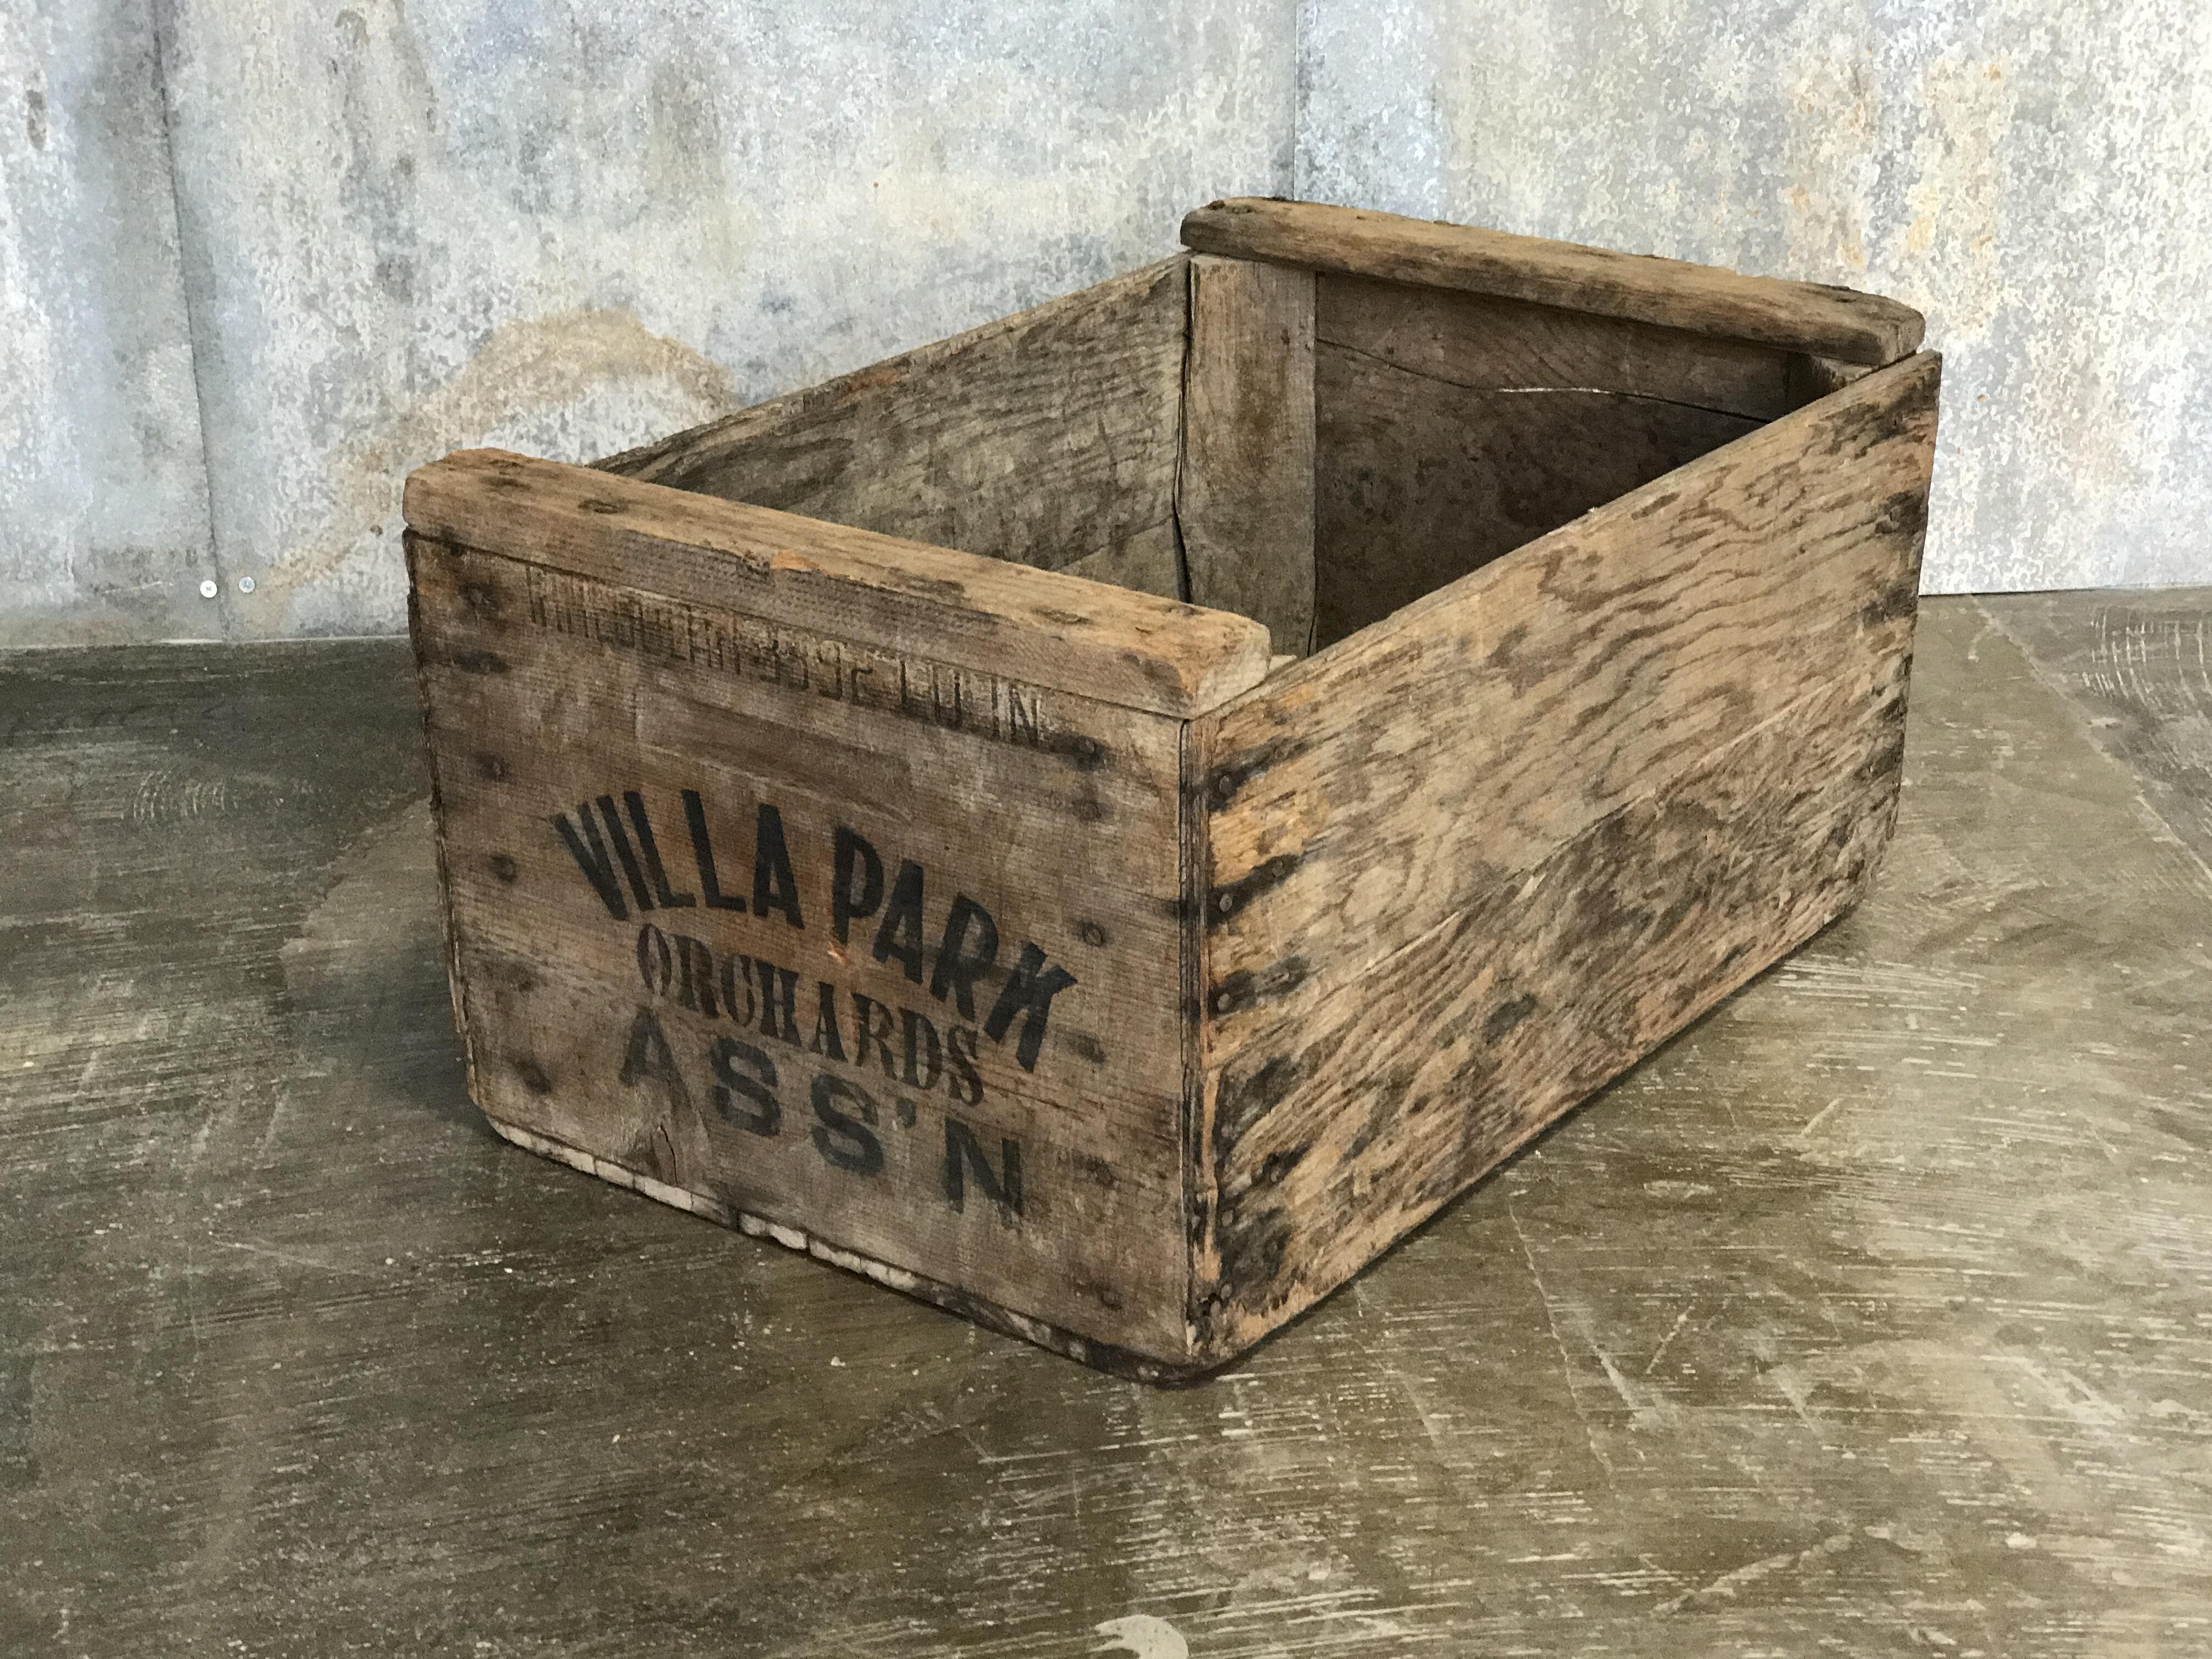 Vintage Villa Park Orange Crate The Crate People